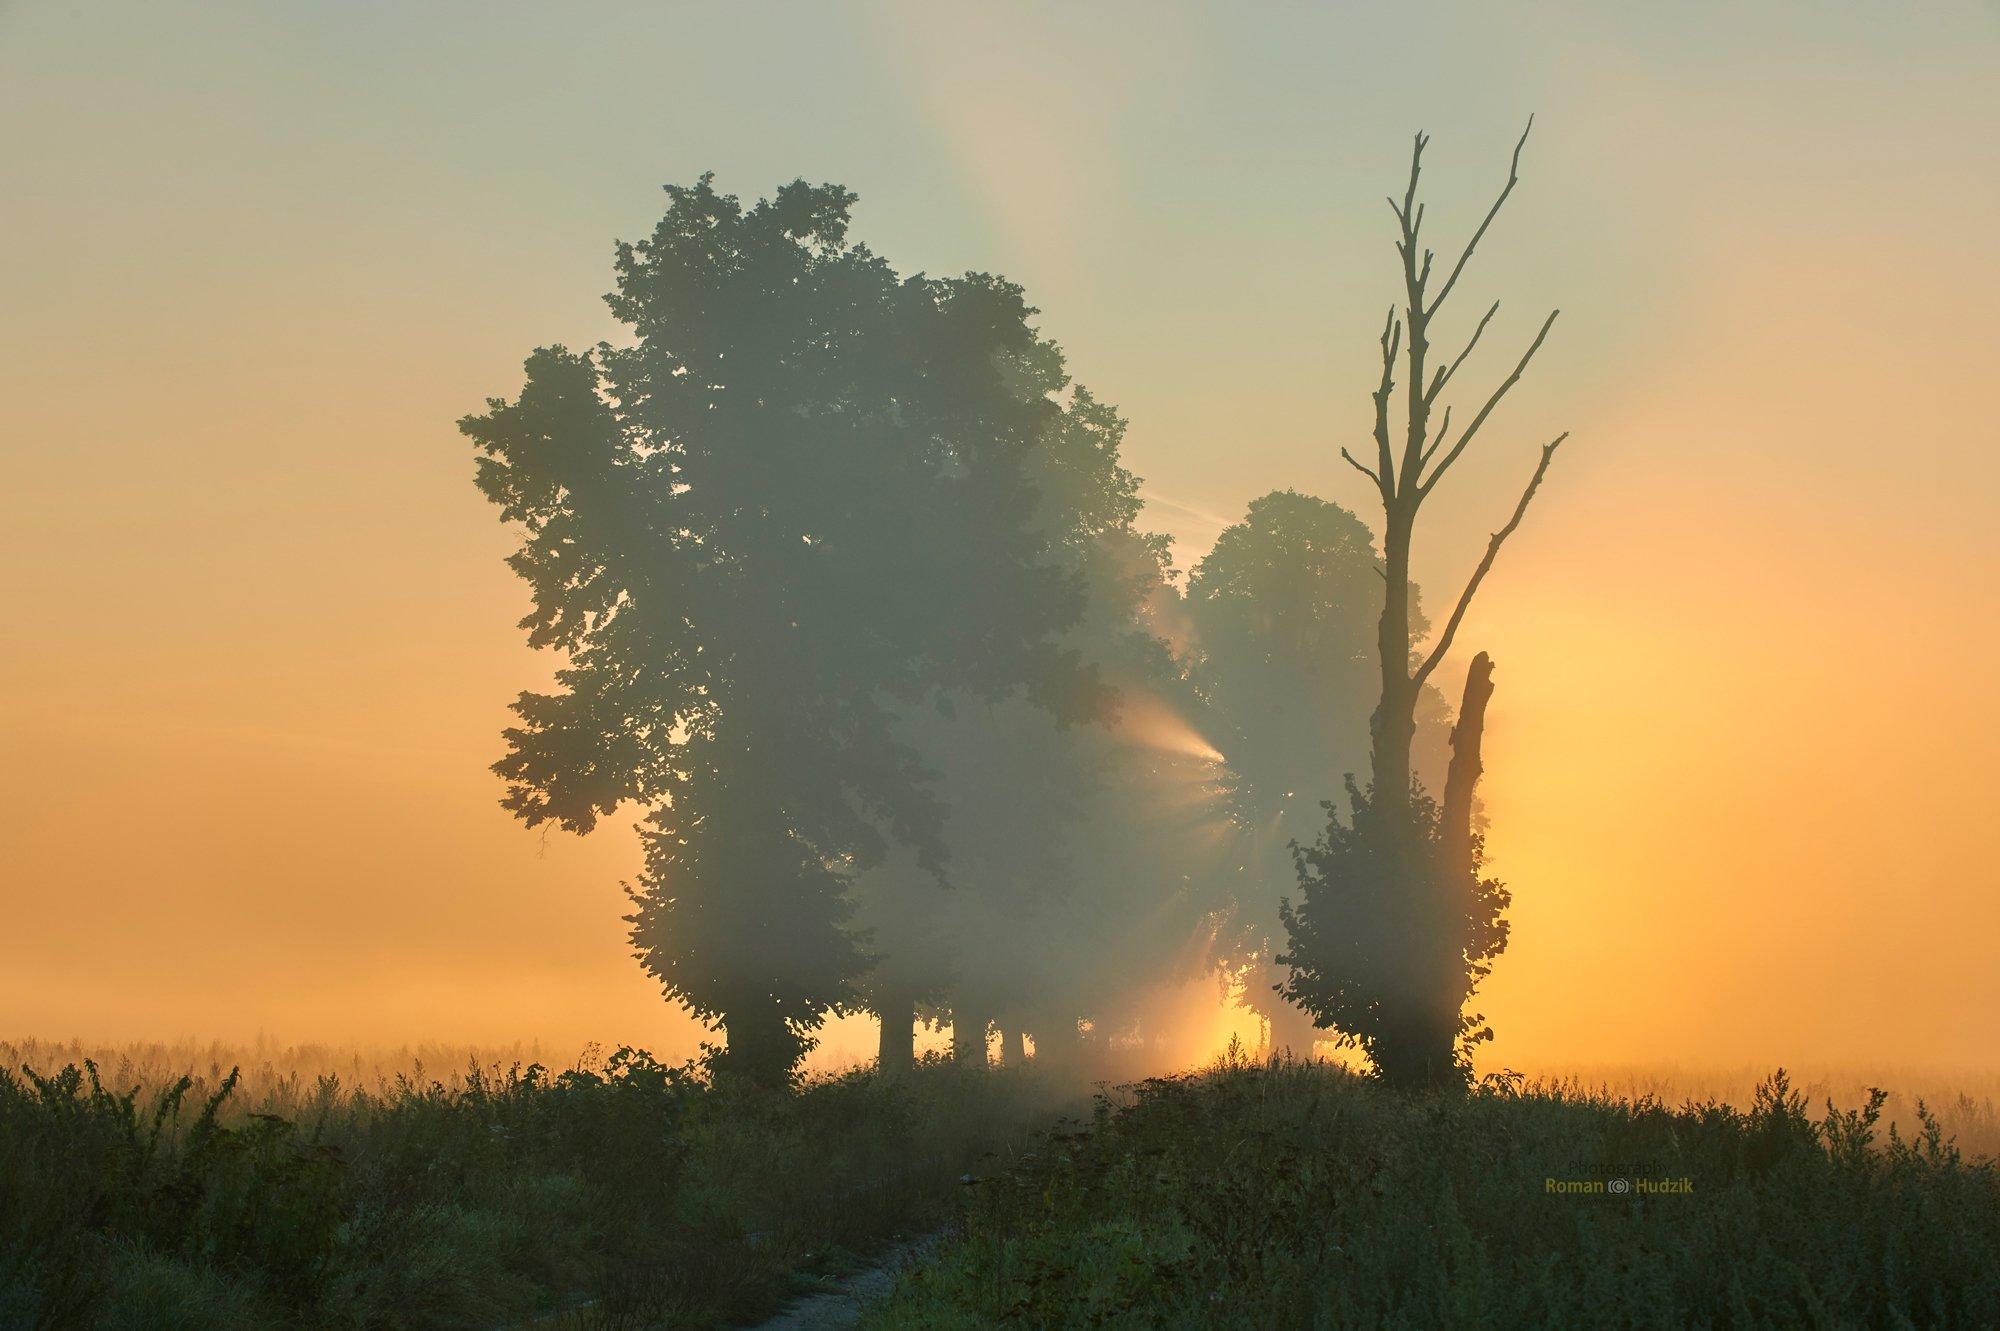 Misty morning, sunrise, landscape, fog, clouds, fields,, Hudzik Roman